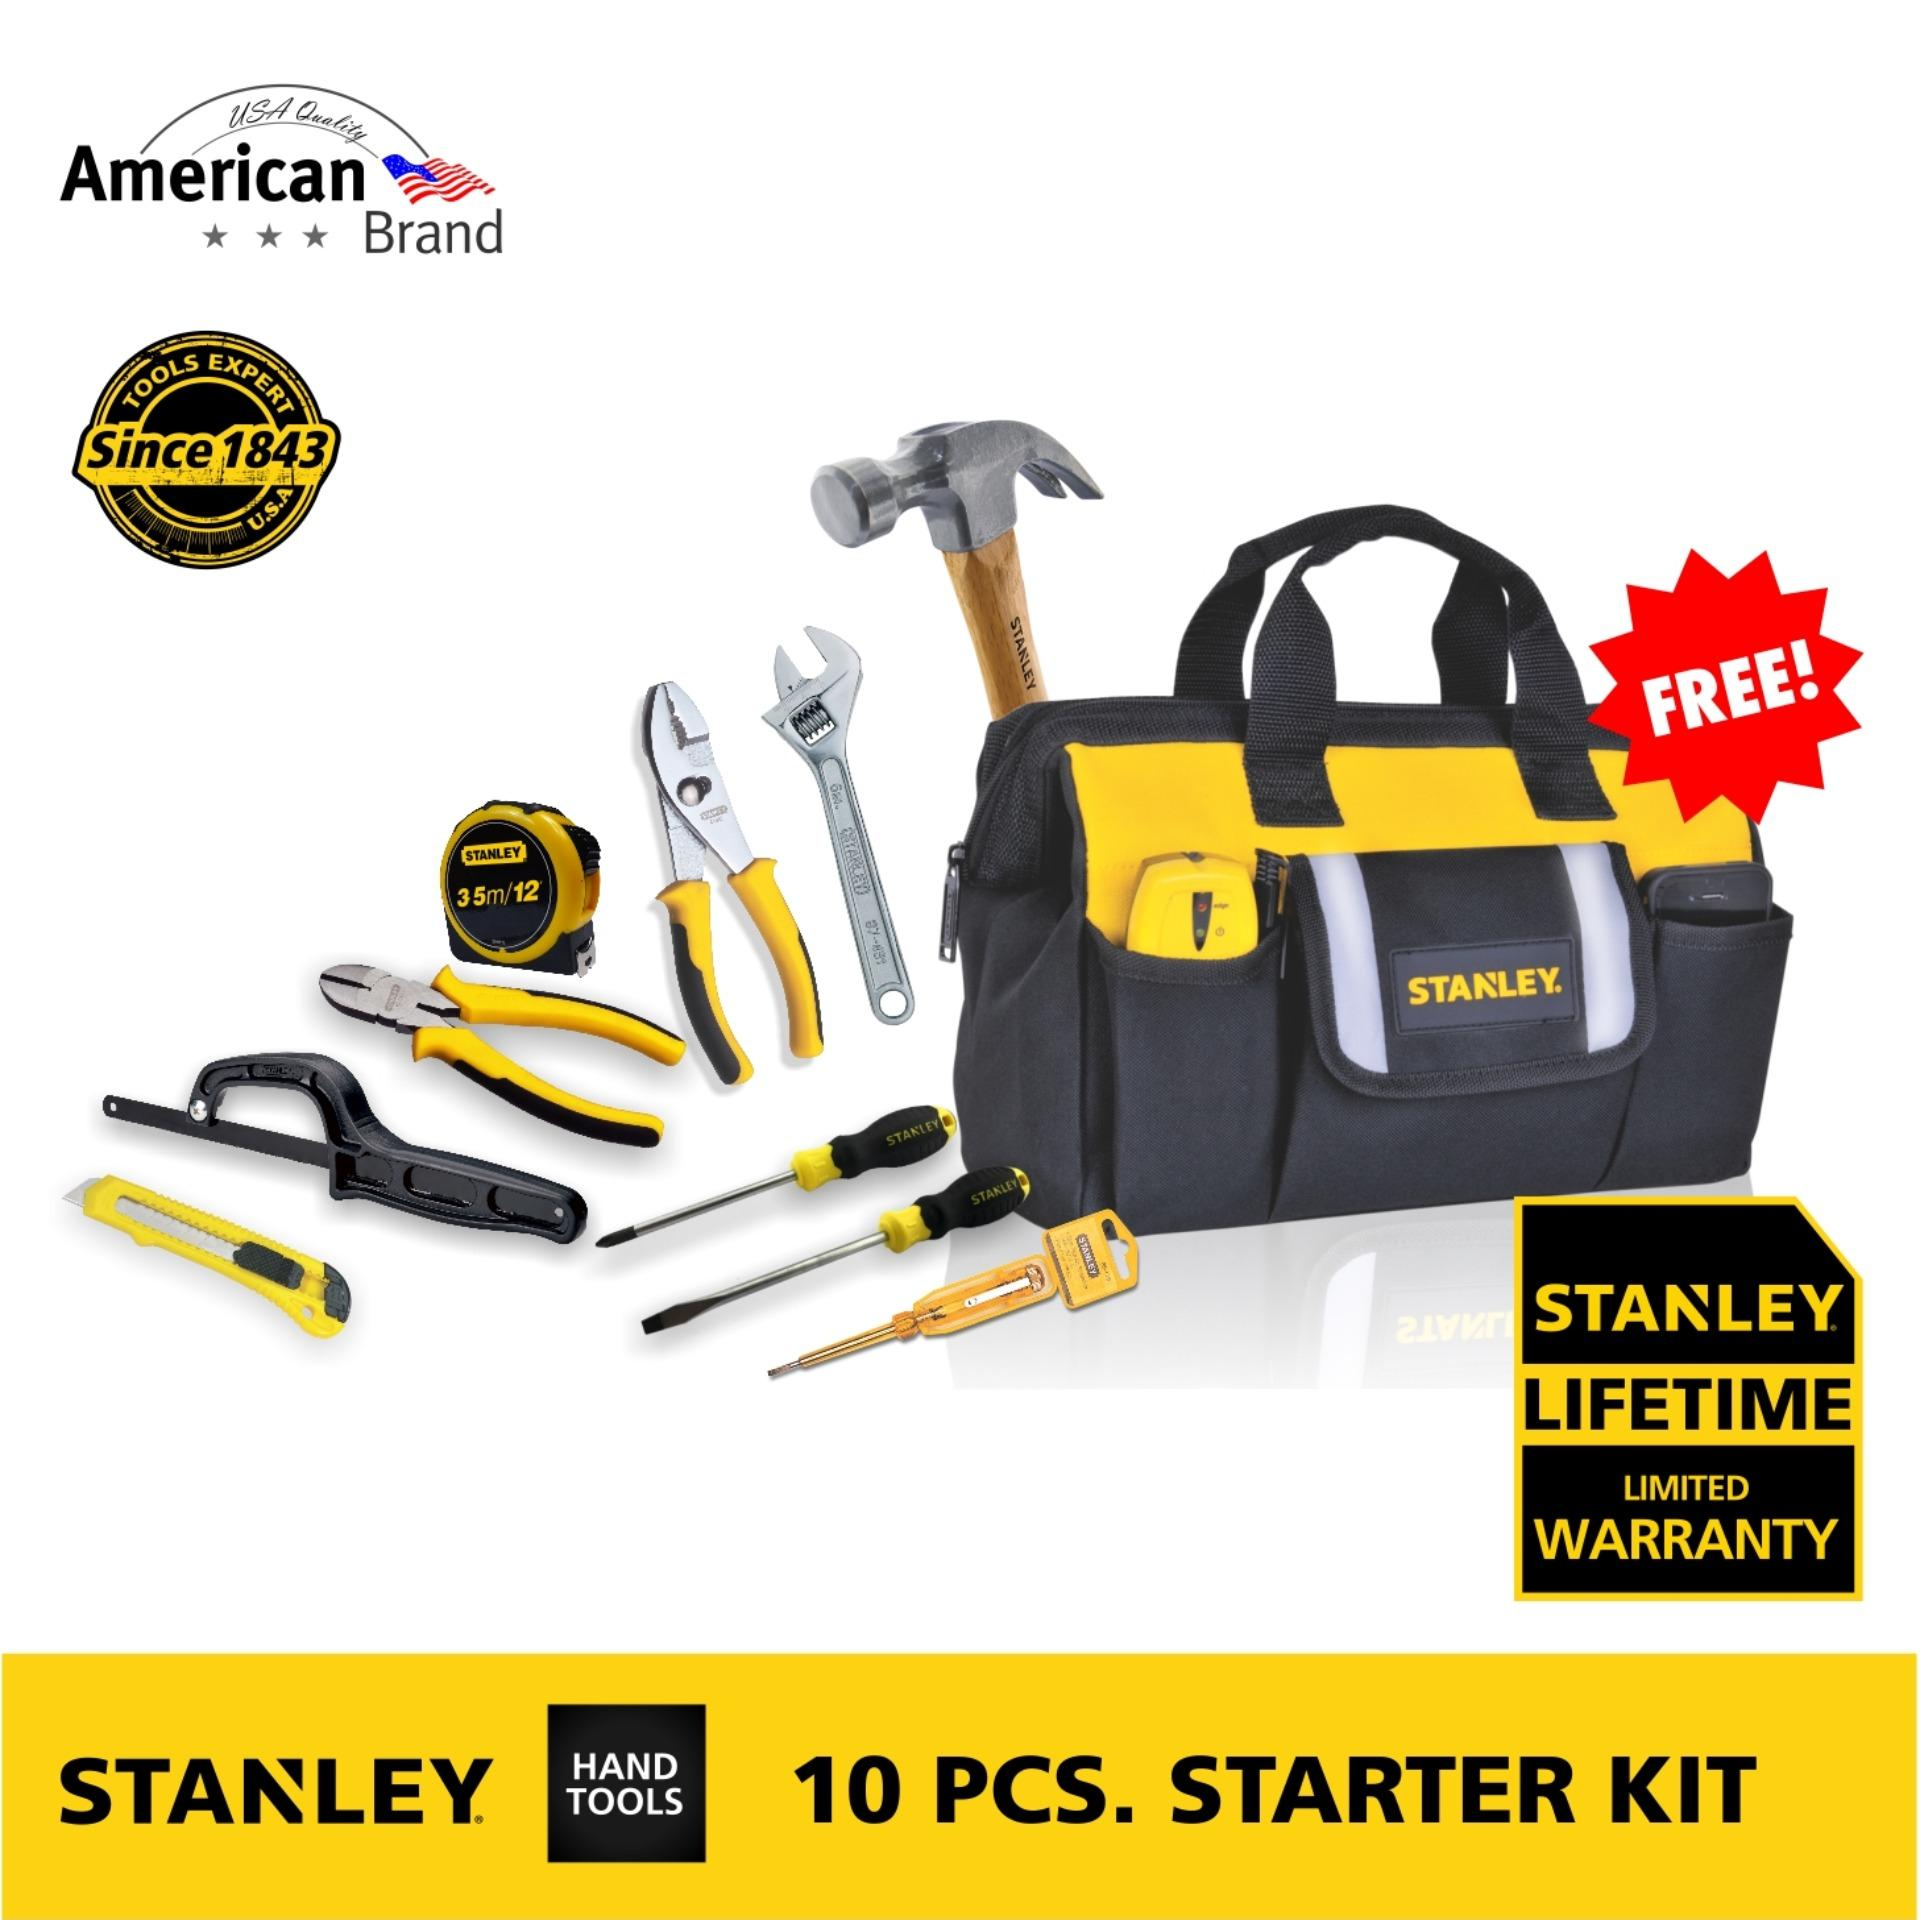 Stanley Philippines Price List Jigsaw Hammer Tape Basic 5m 16 10 Piece Starter Hand Tool Kit Black Yellow Brand New